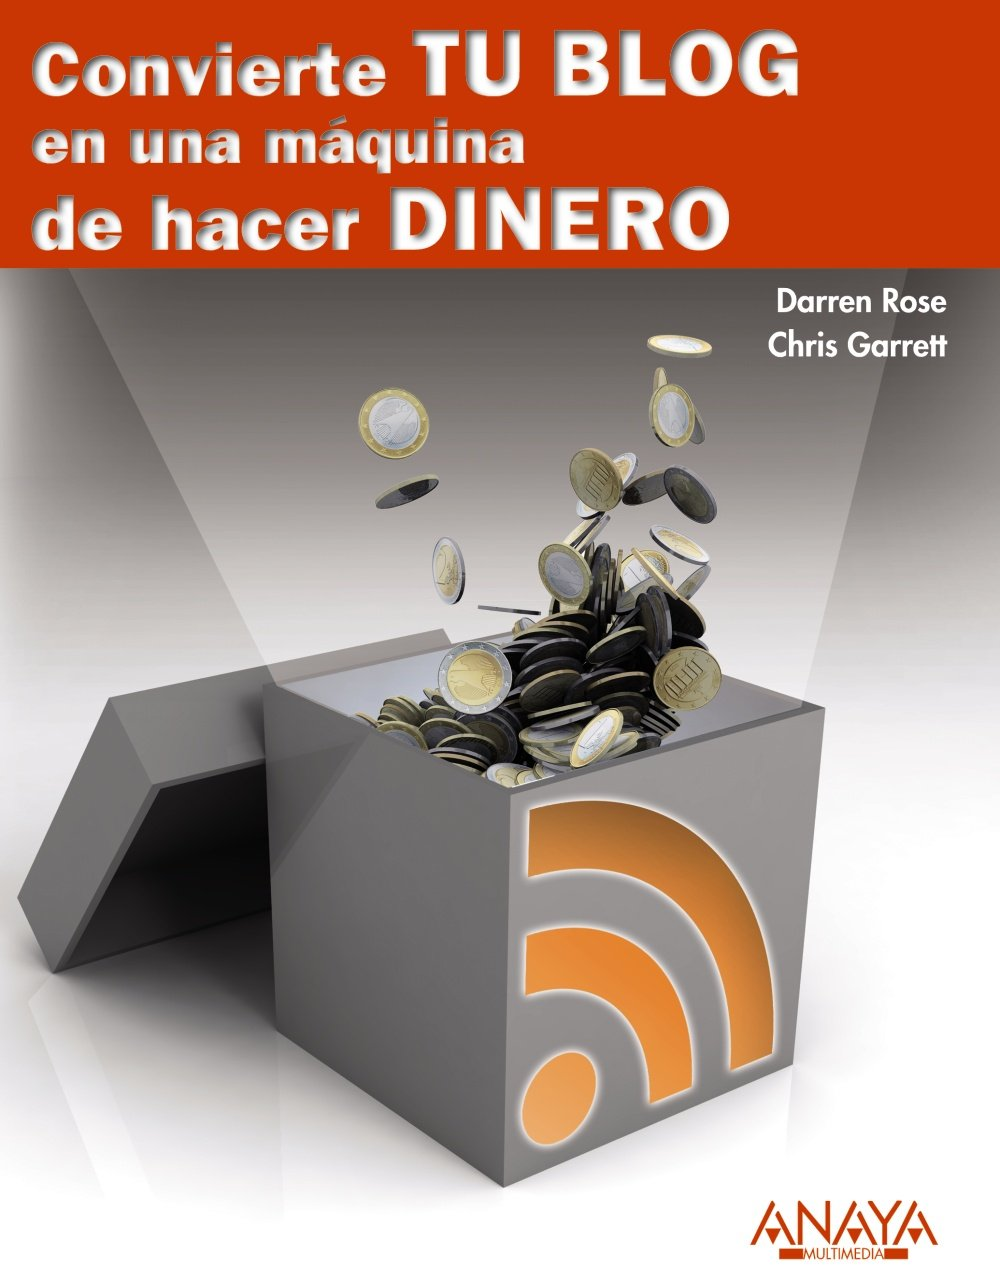 Convierte tu blog en una máquina de hacer dinero (Spanish) Paperback – January 1, 2011